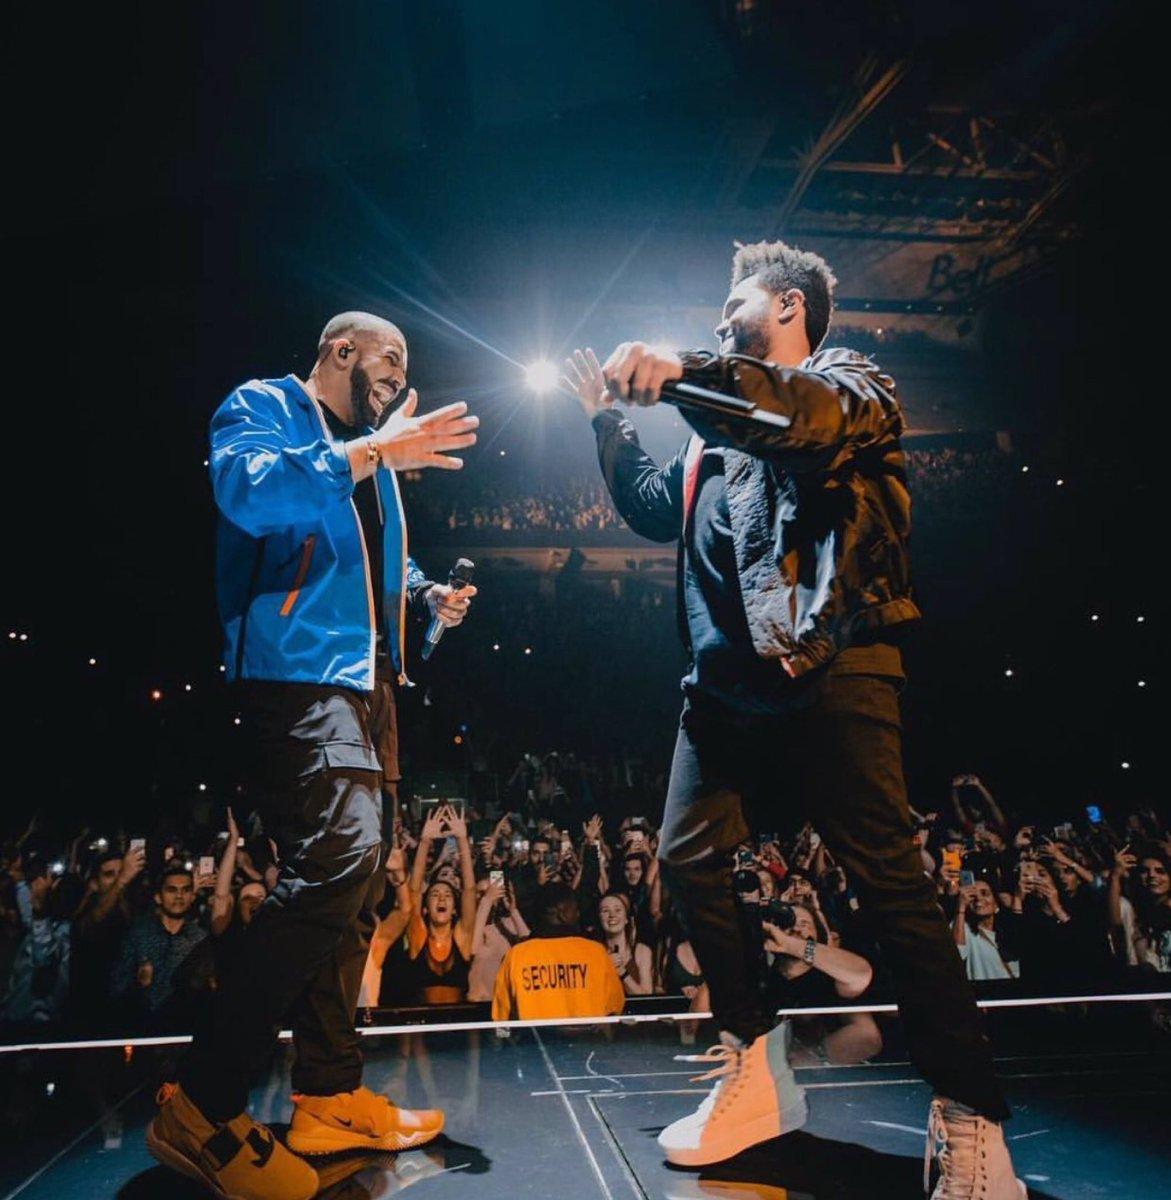 DOWNLOAD MP3 The Weeknd - Practice [OG]